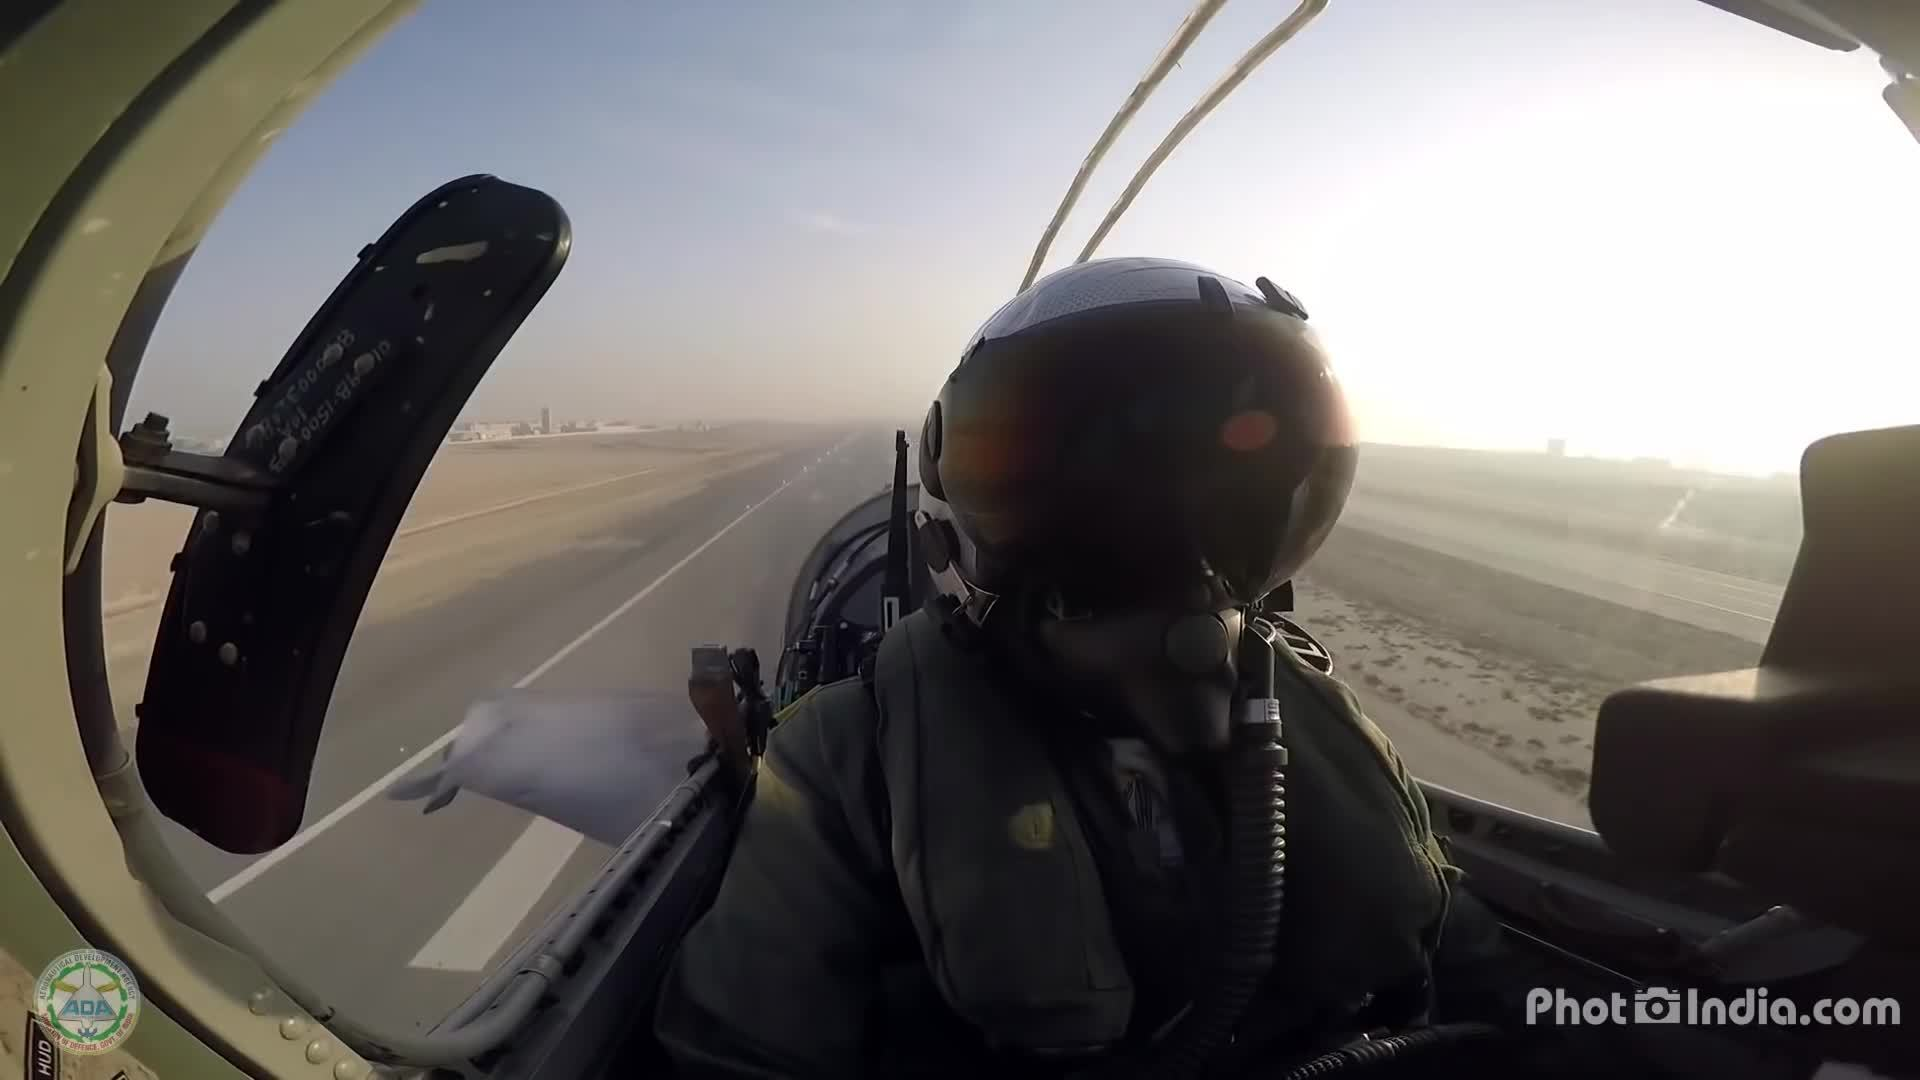 militarygfys, LCA Tejas At Bahrain - Stunning GoPro From Cockpit GIFs